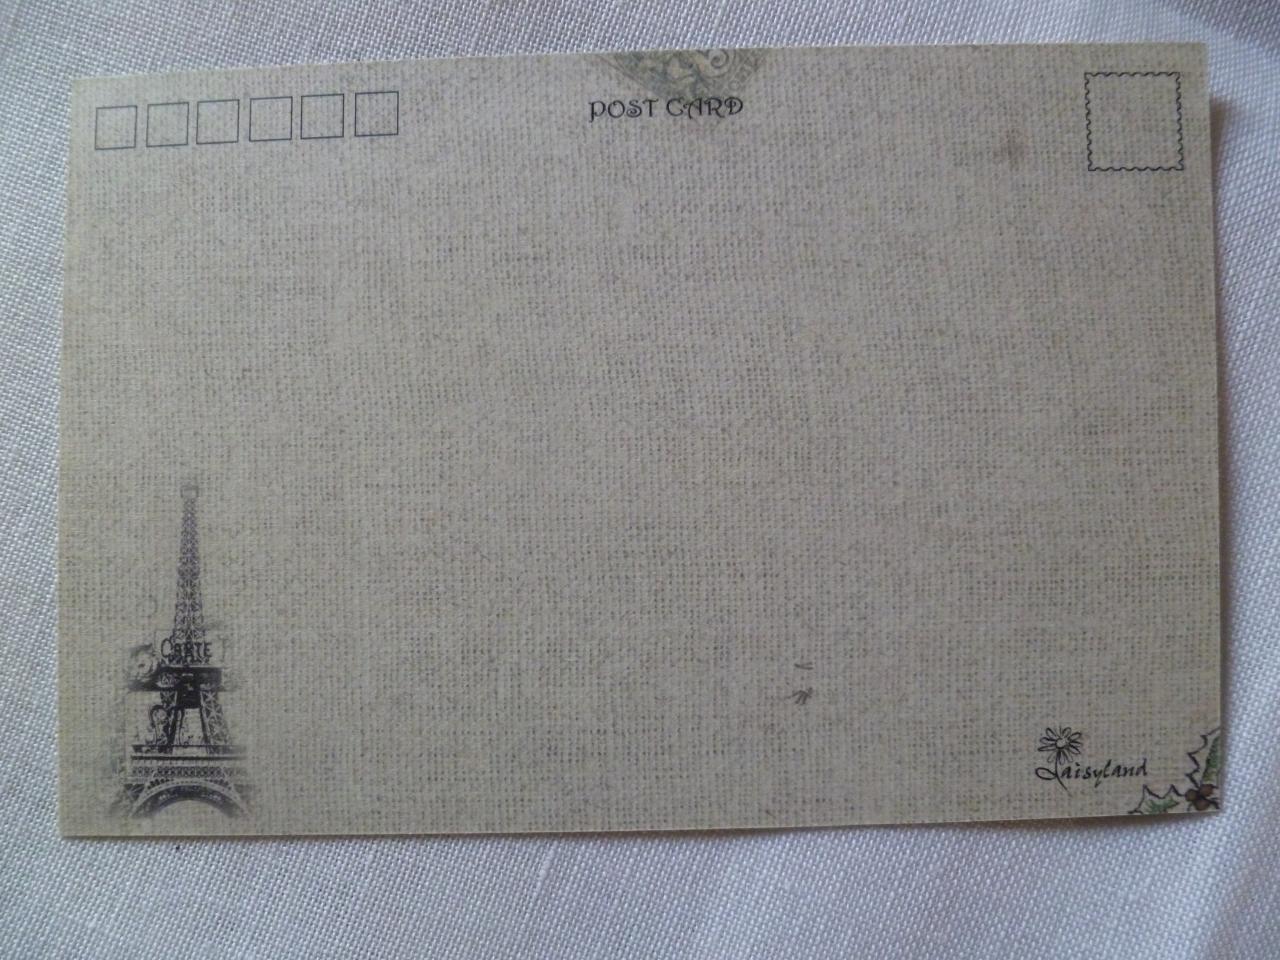 carte-postale-antique-paris-04.jpg